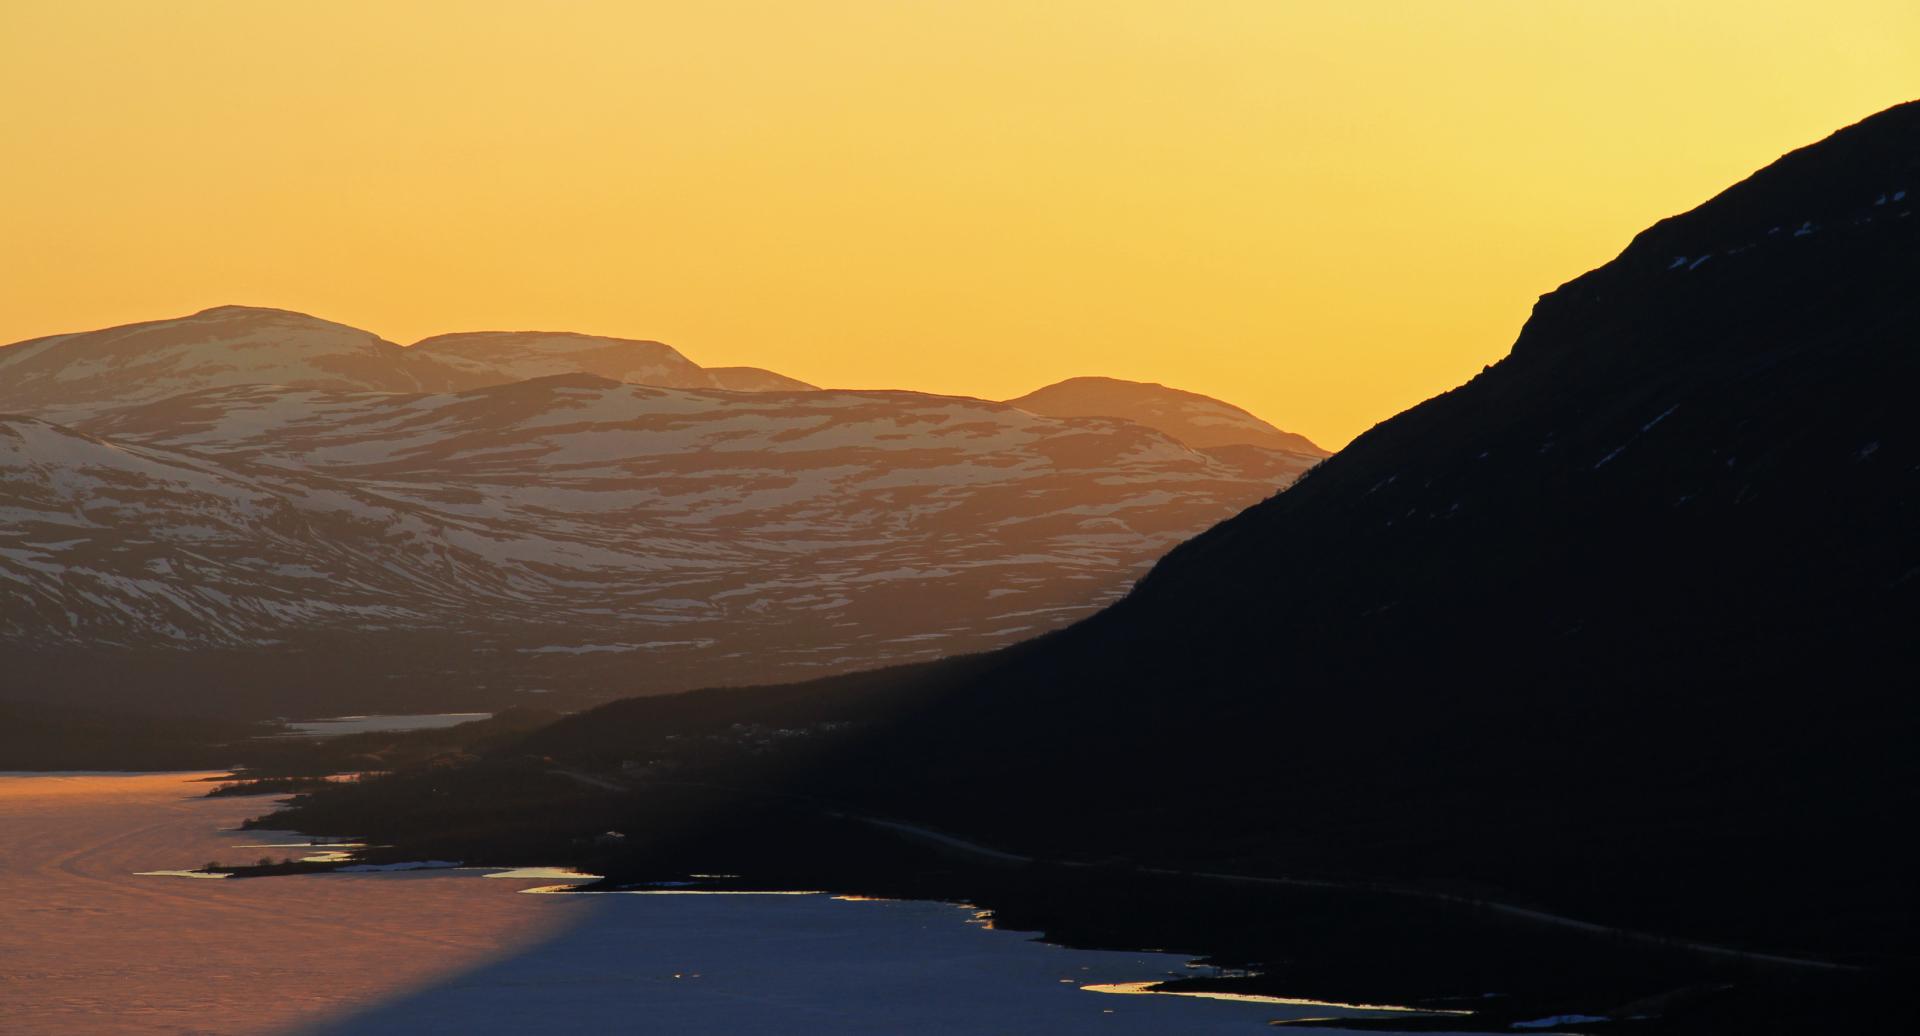 Kilpisjärvi-Visualfinland-JuhaKalaoja